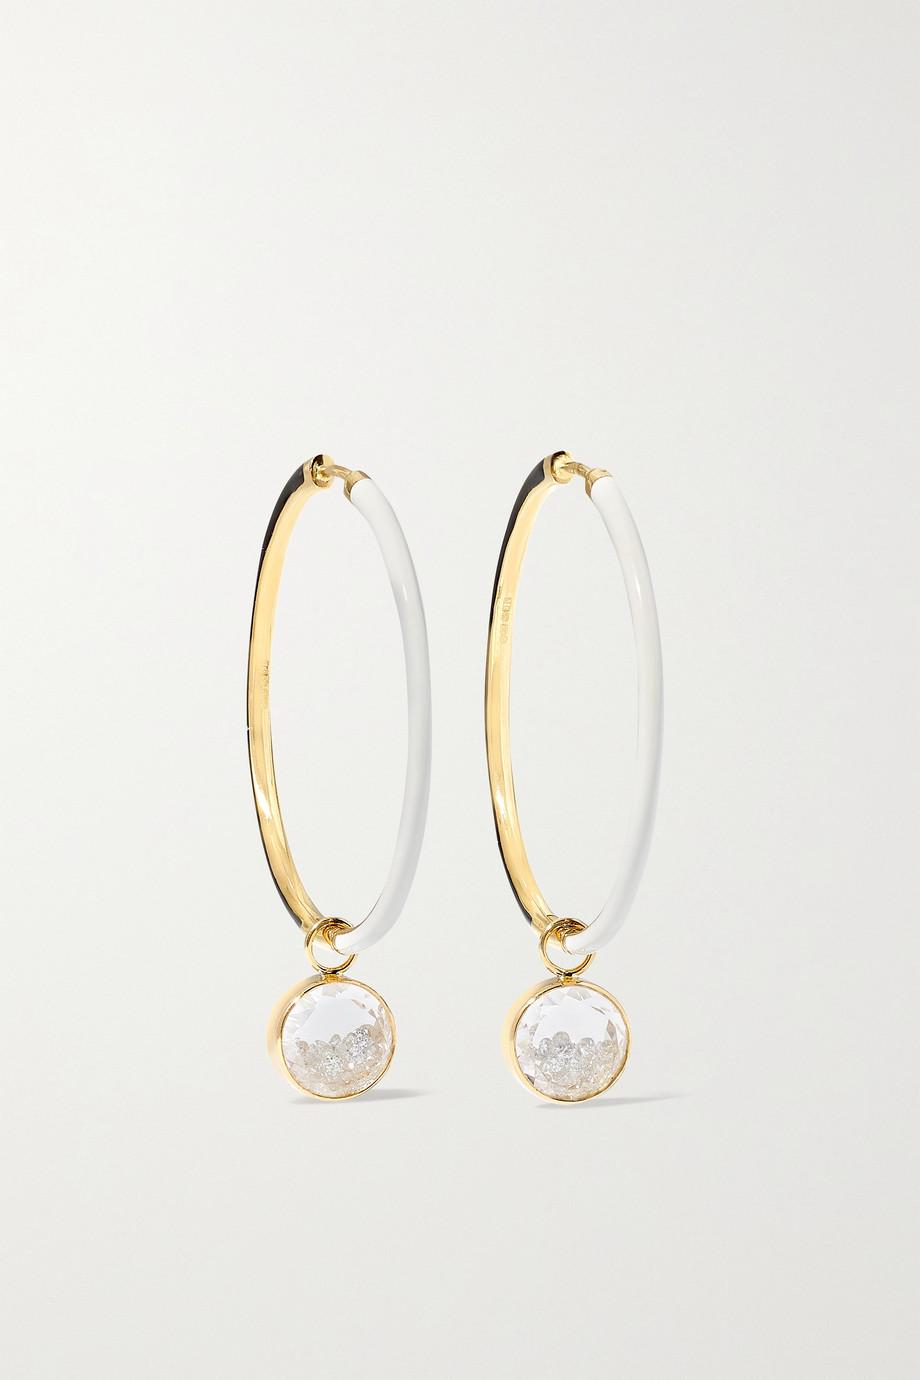 Moritz Glik 18-karat gold, enamel, sapphire crystal and diamond hoop earrings